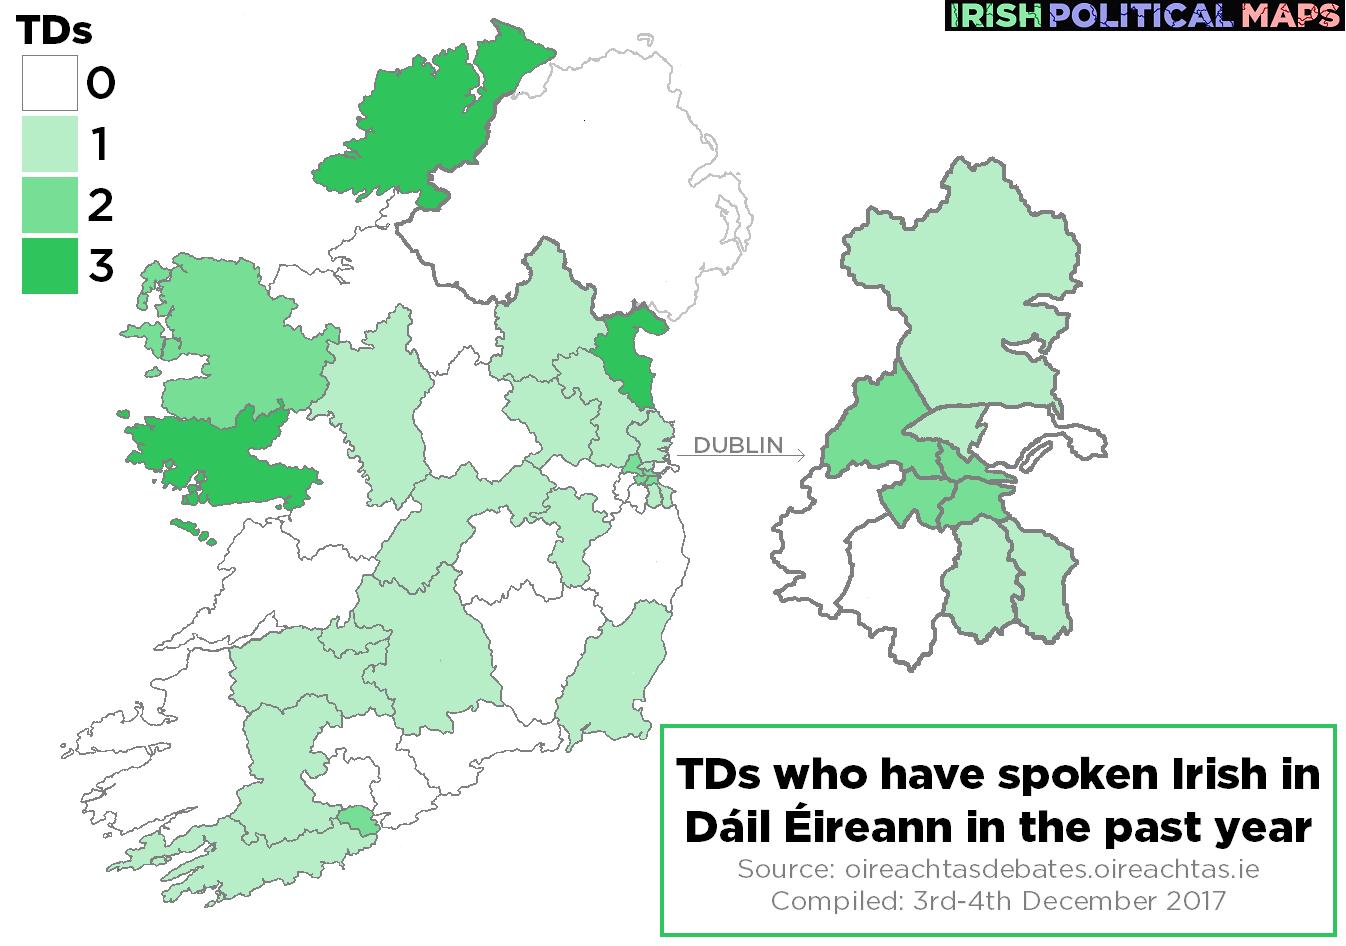 Map Of Ireland Gaeilge.Irish Political Maps How Many Tds Have Spoken Irish In Dail Eireann